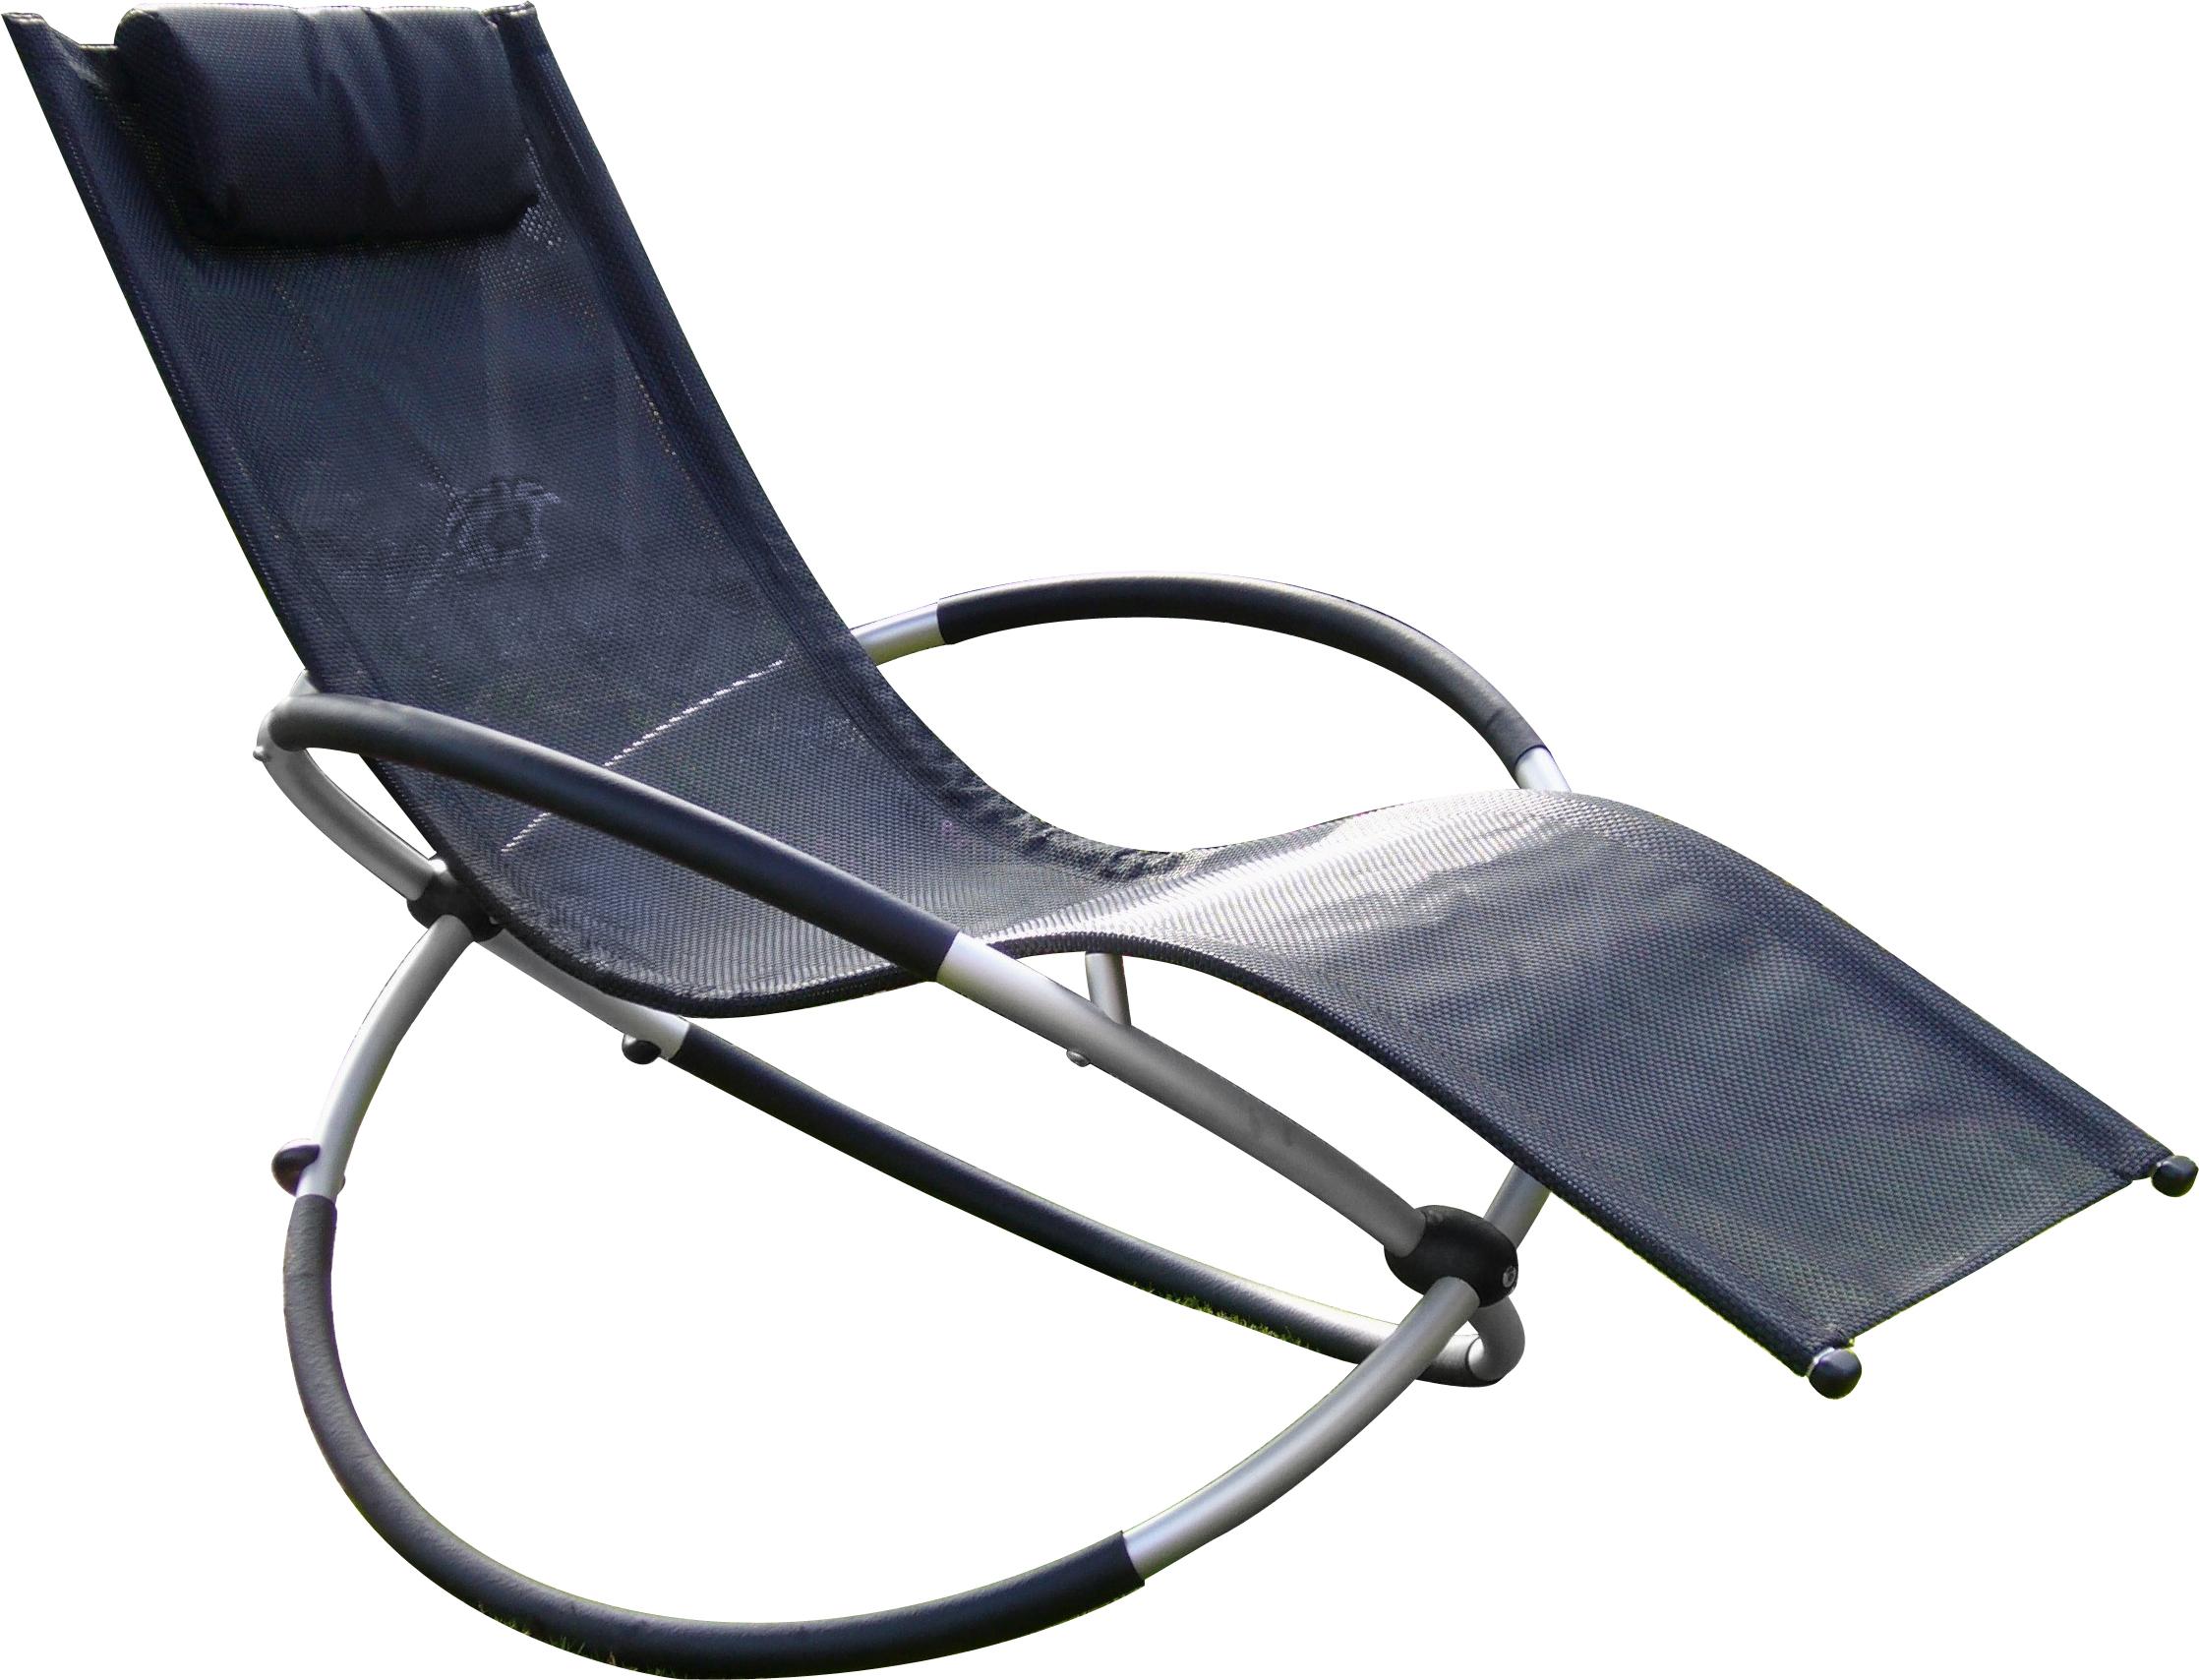 gartenstuhl liegestuhl